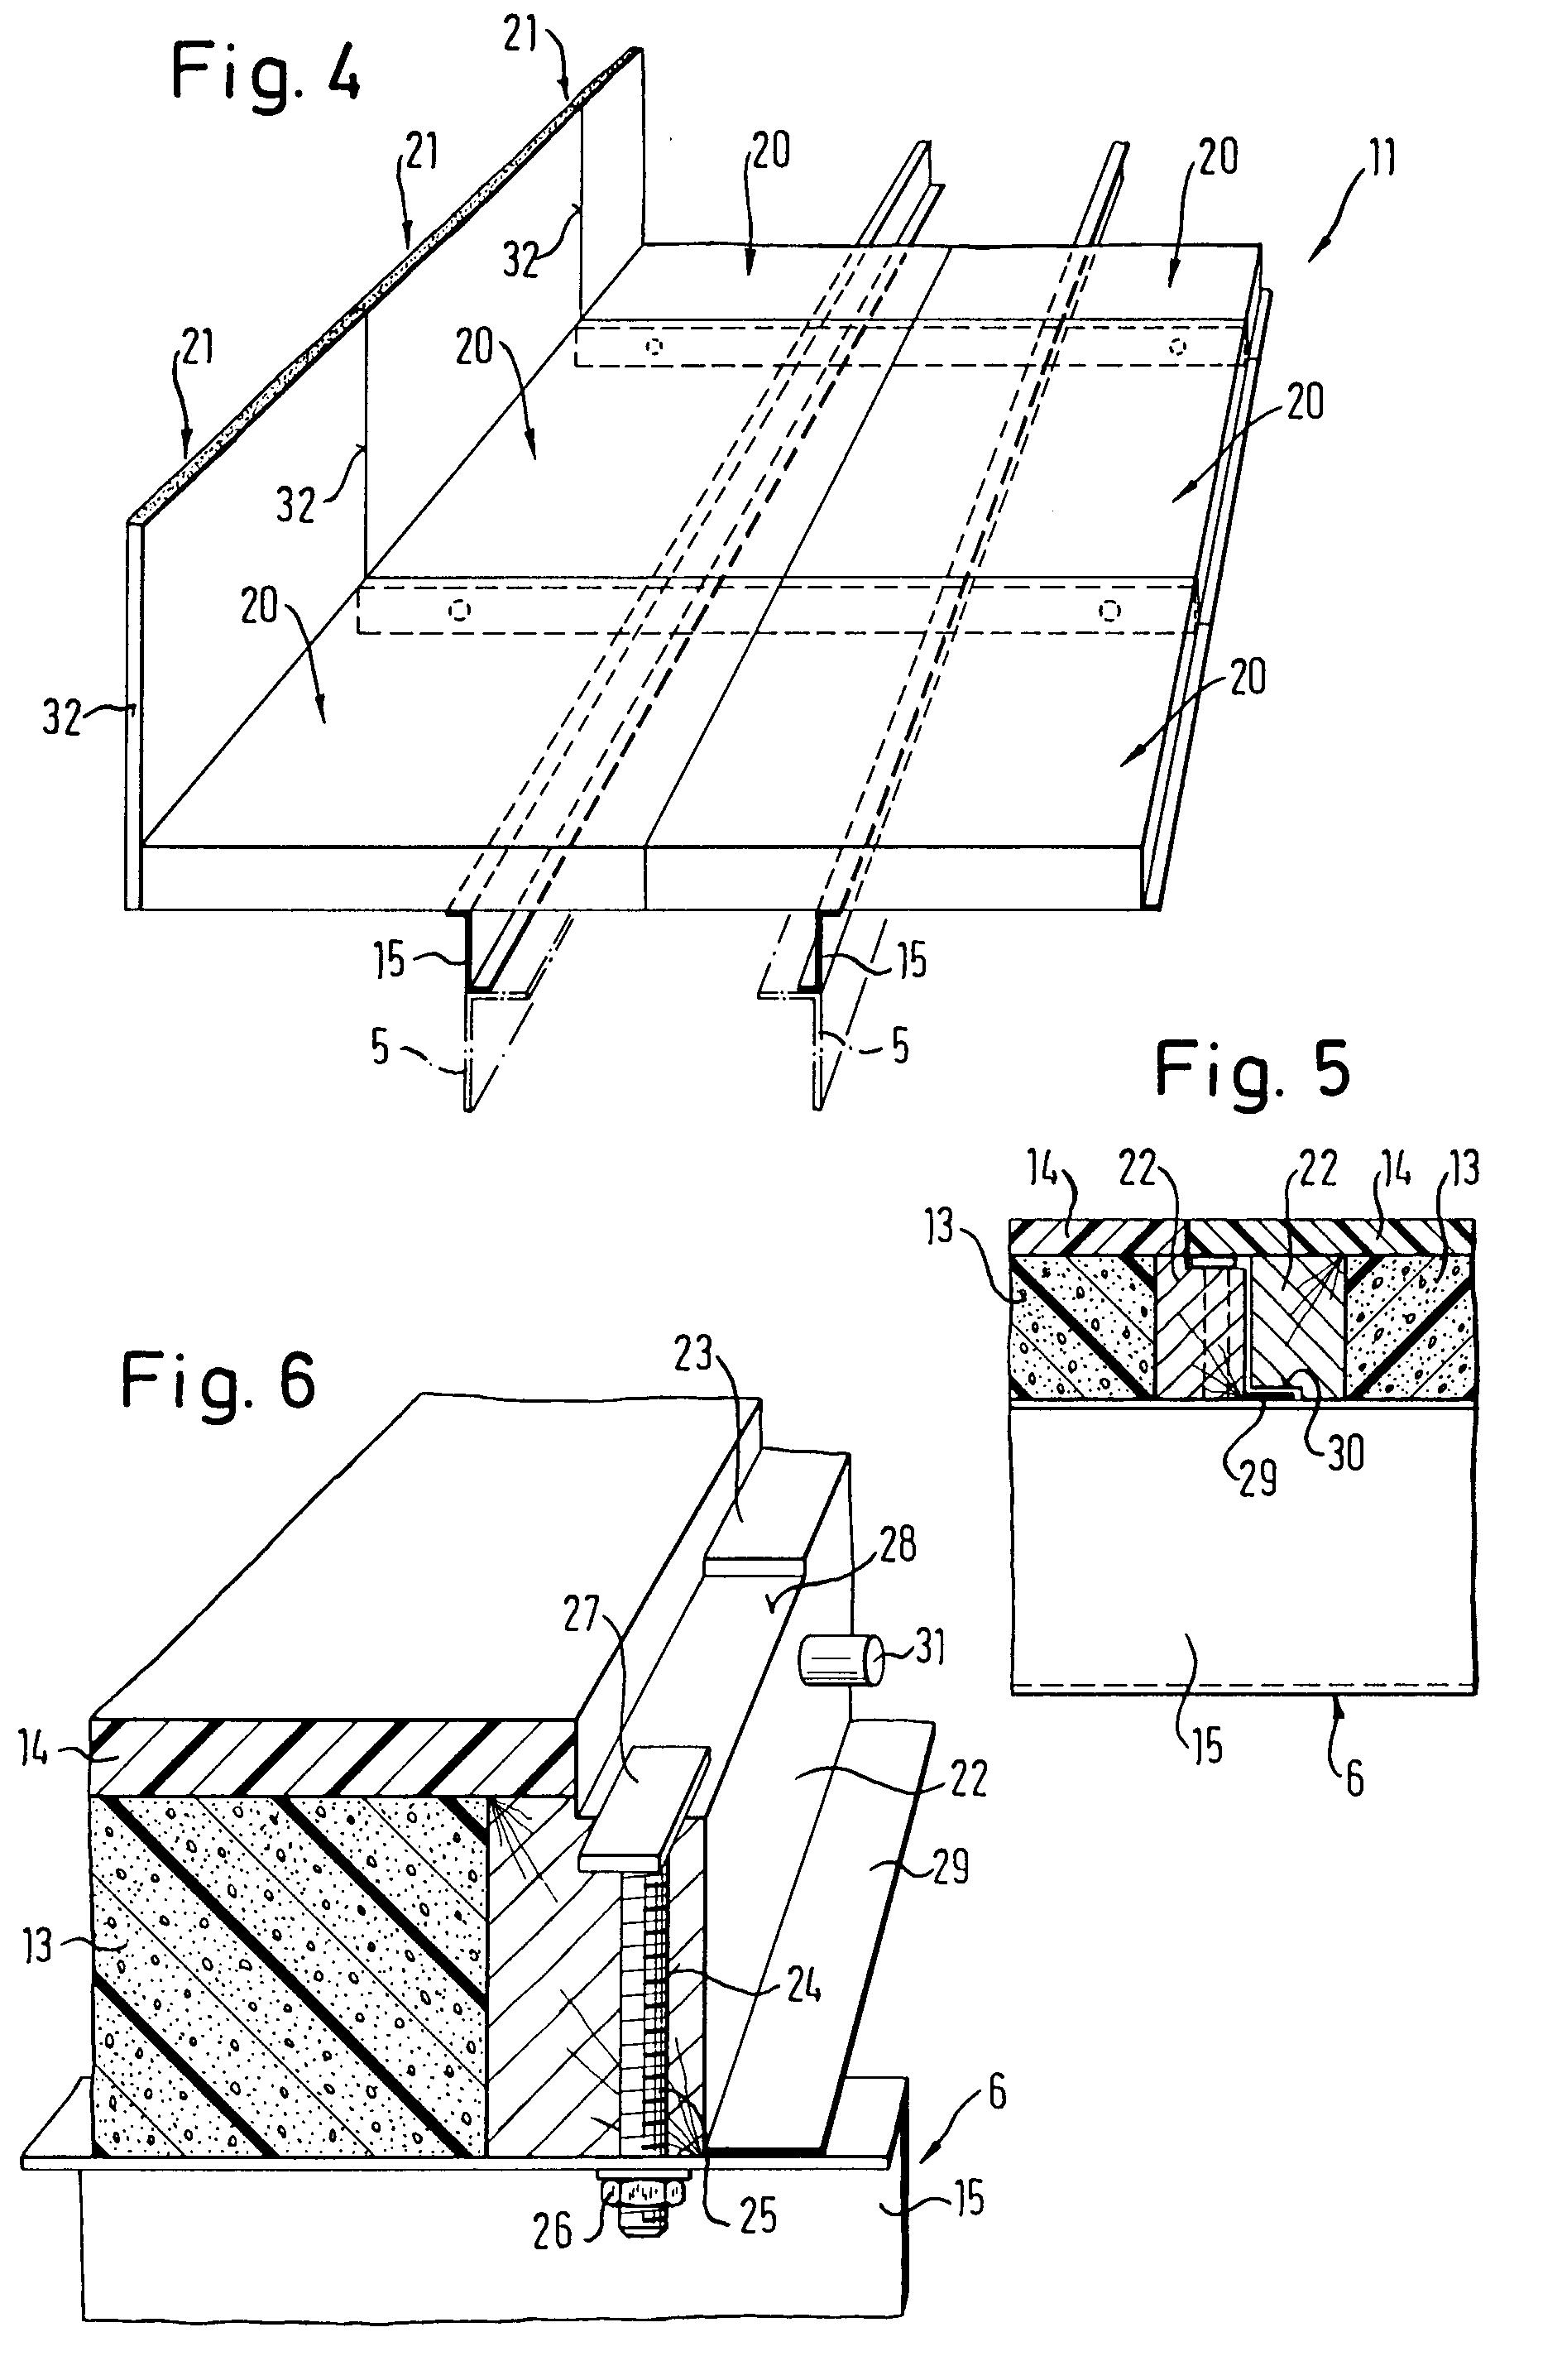 patente ep0607575a1 bausatz f r kofferaufbauten google patentes. Black Bedroom Furniture Sets. Home Design Ideas